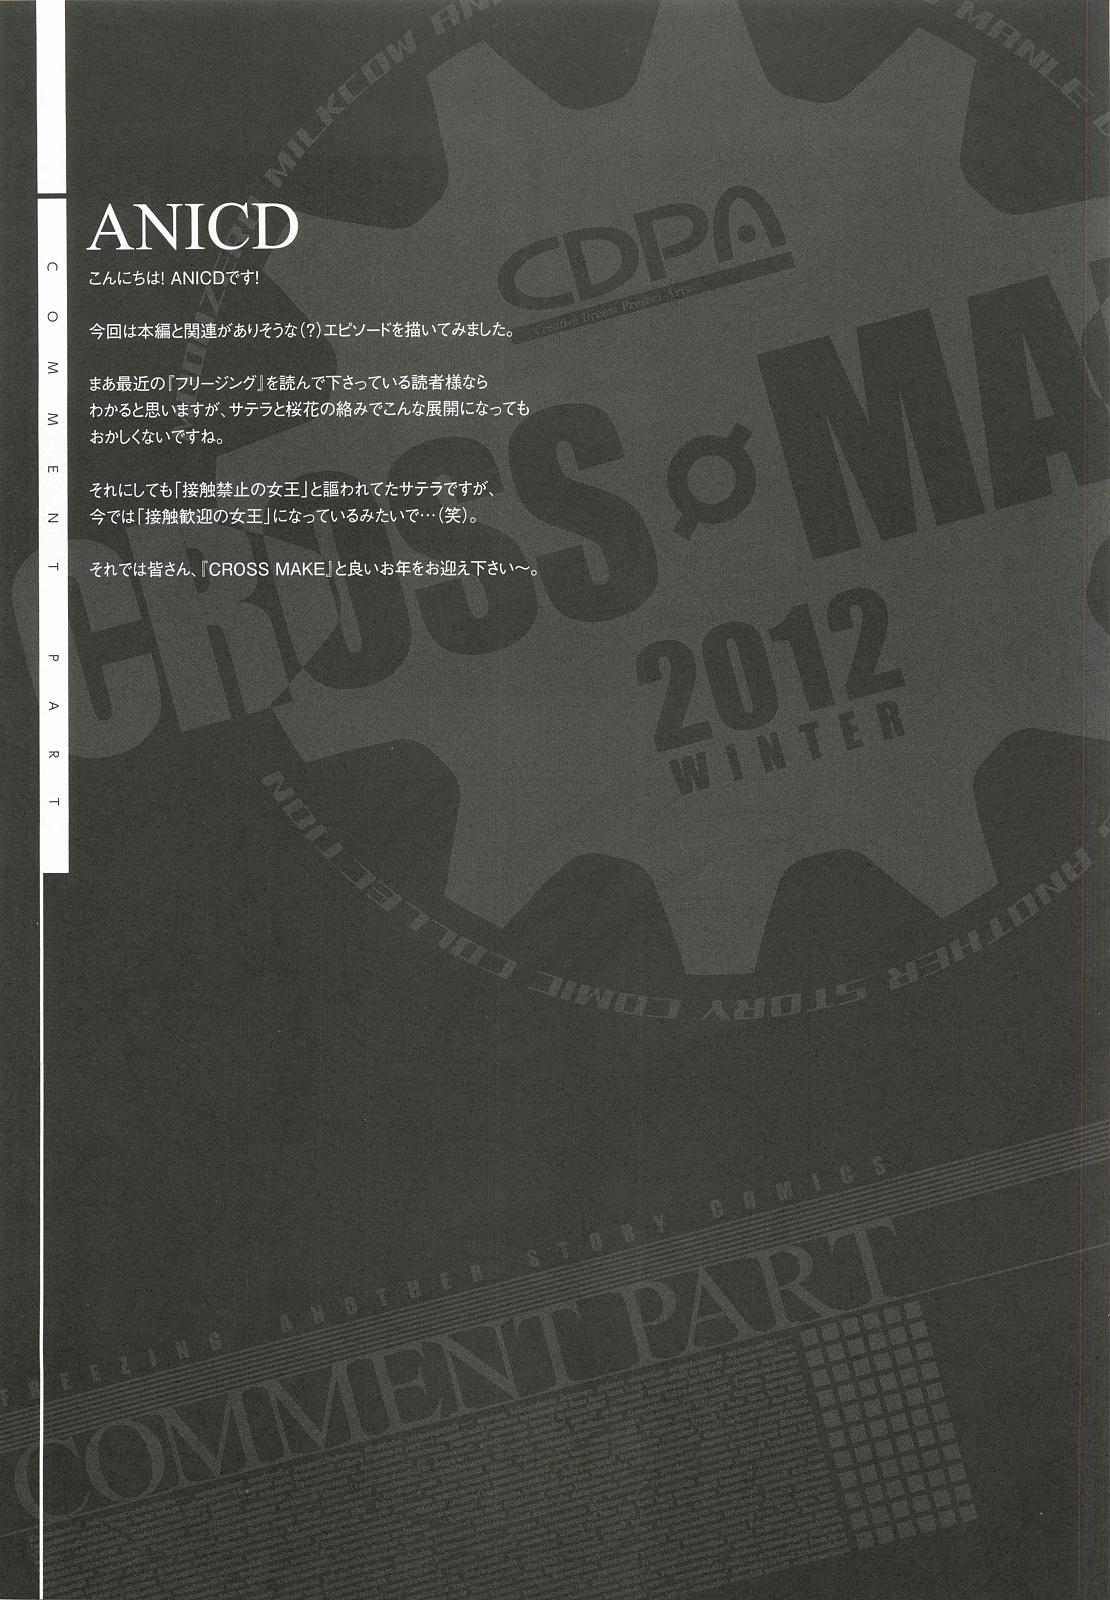 CROSS MAKE 2012 WINTER 44